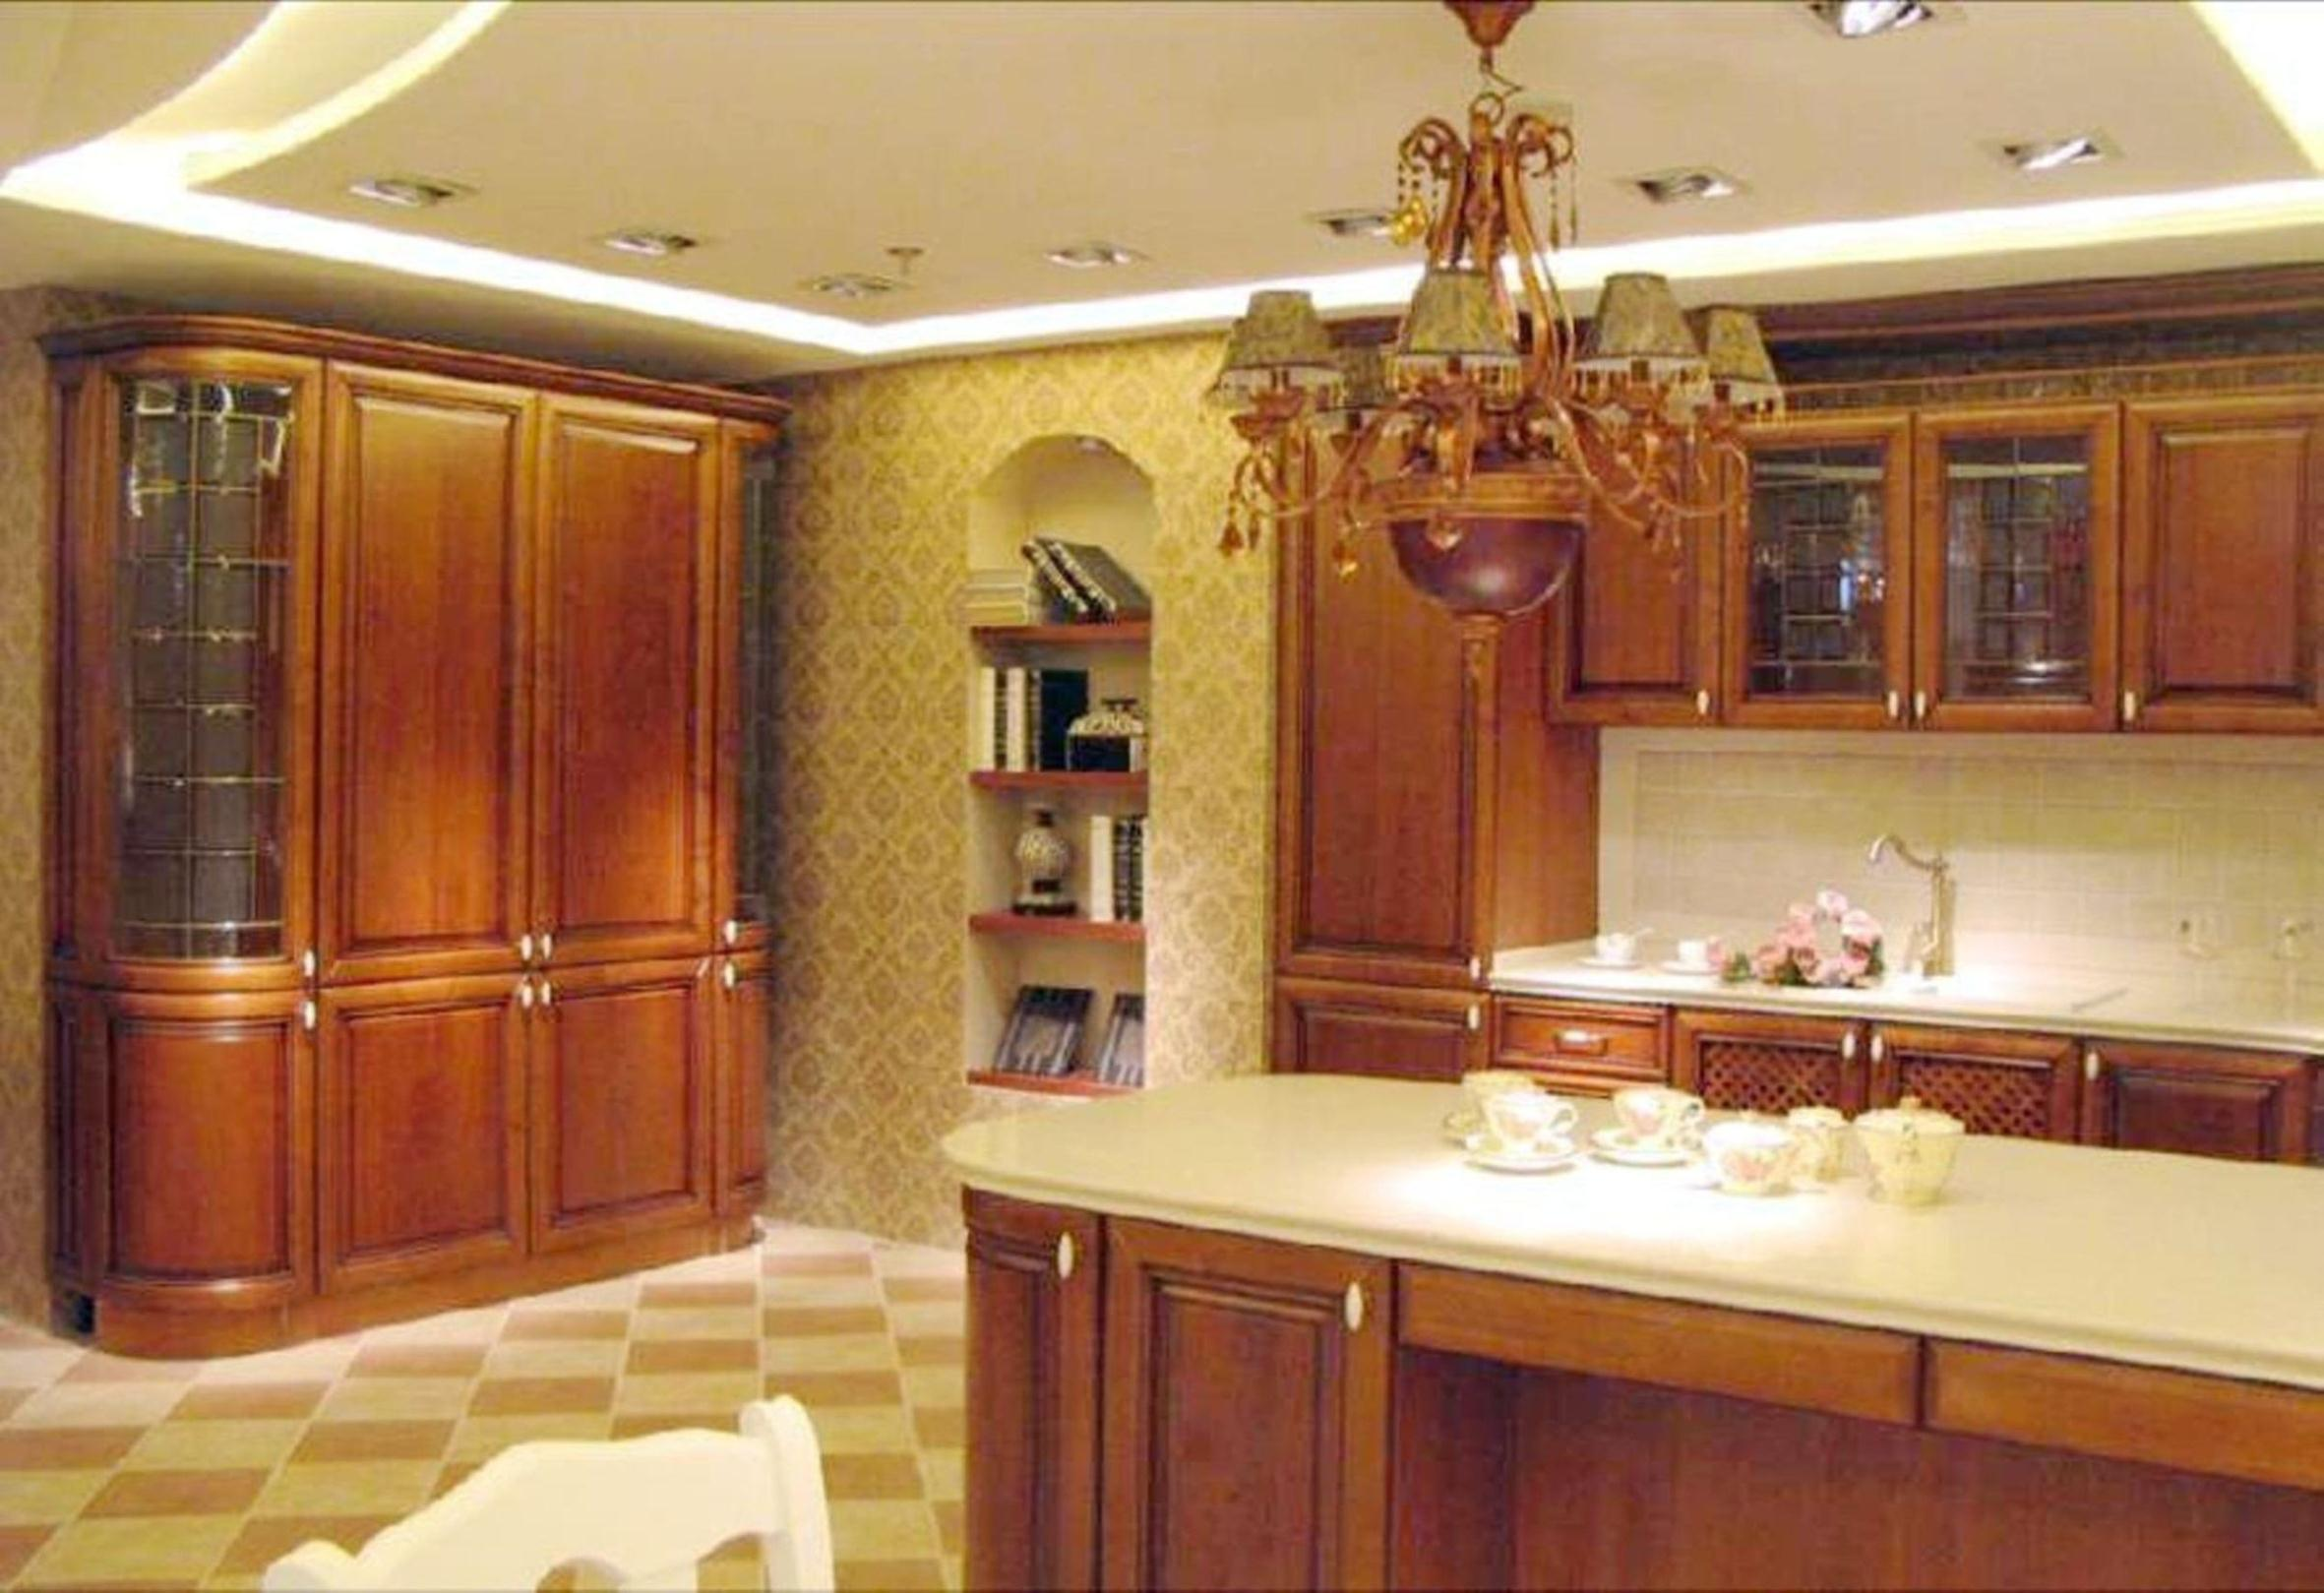 Muebles De Cocina En Madera Solida # azarak.com > Ideas Interesantes ...